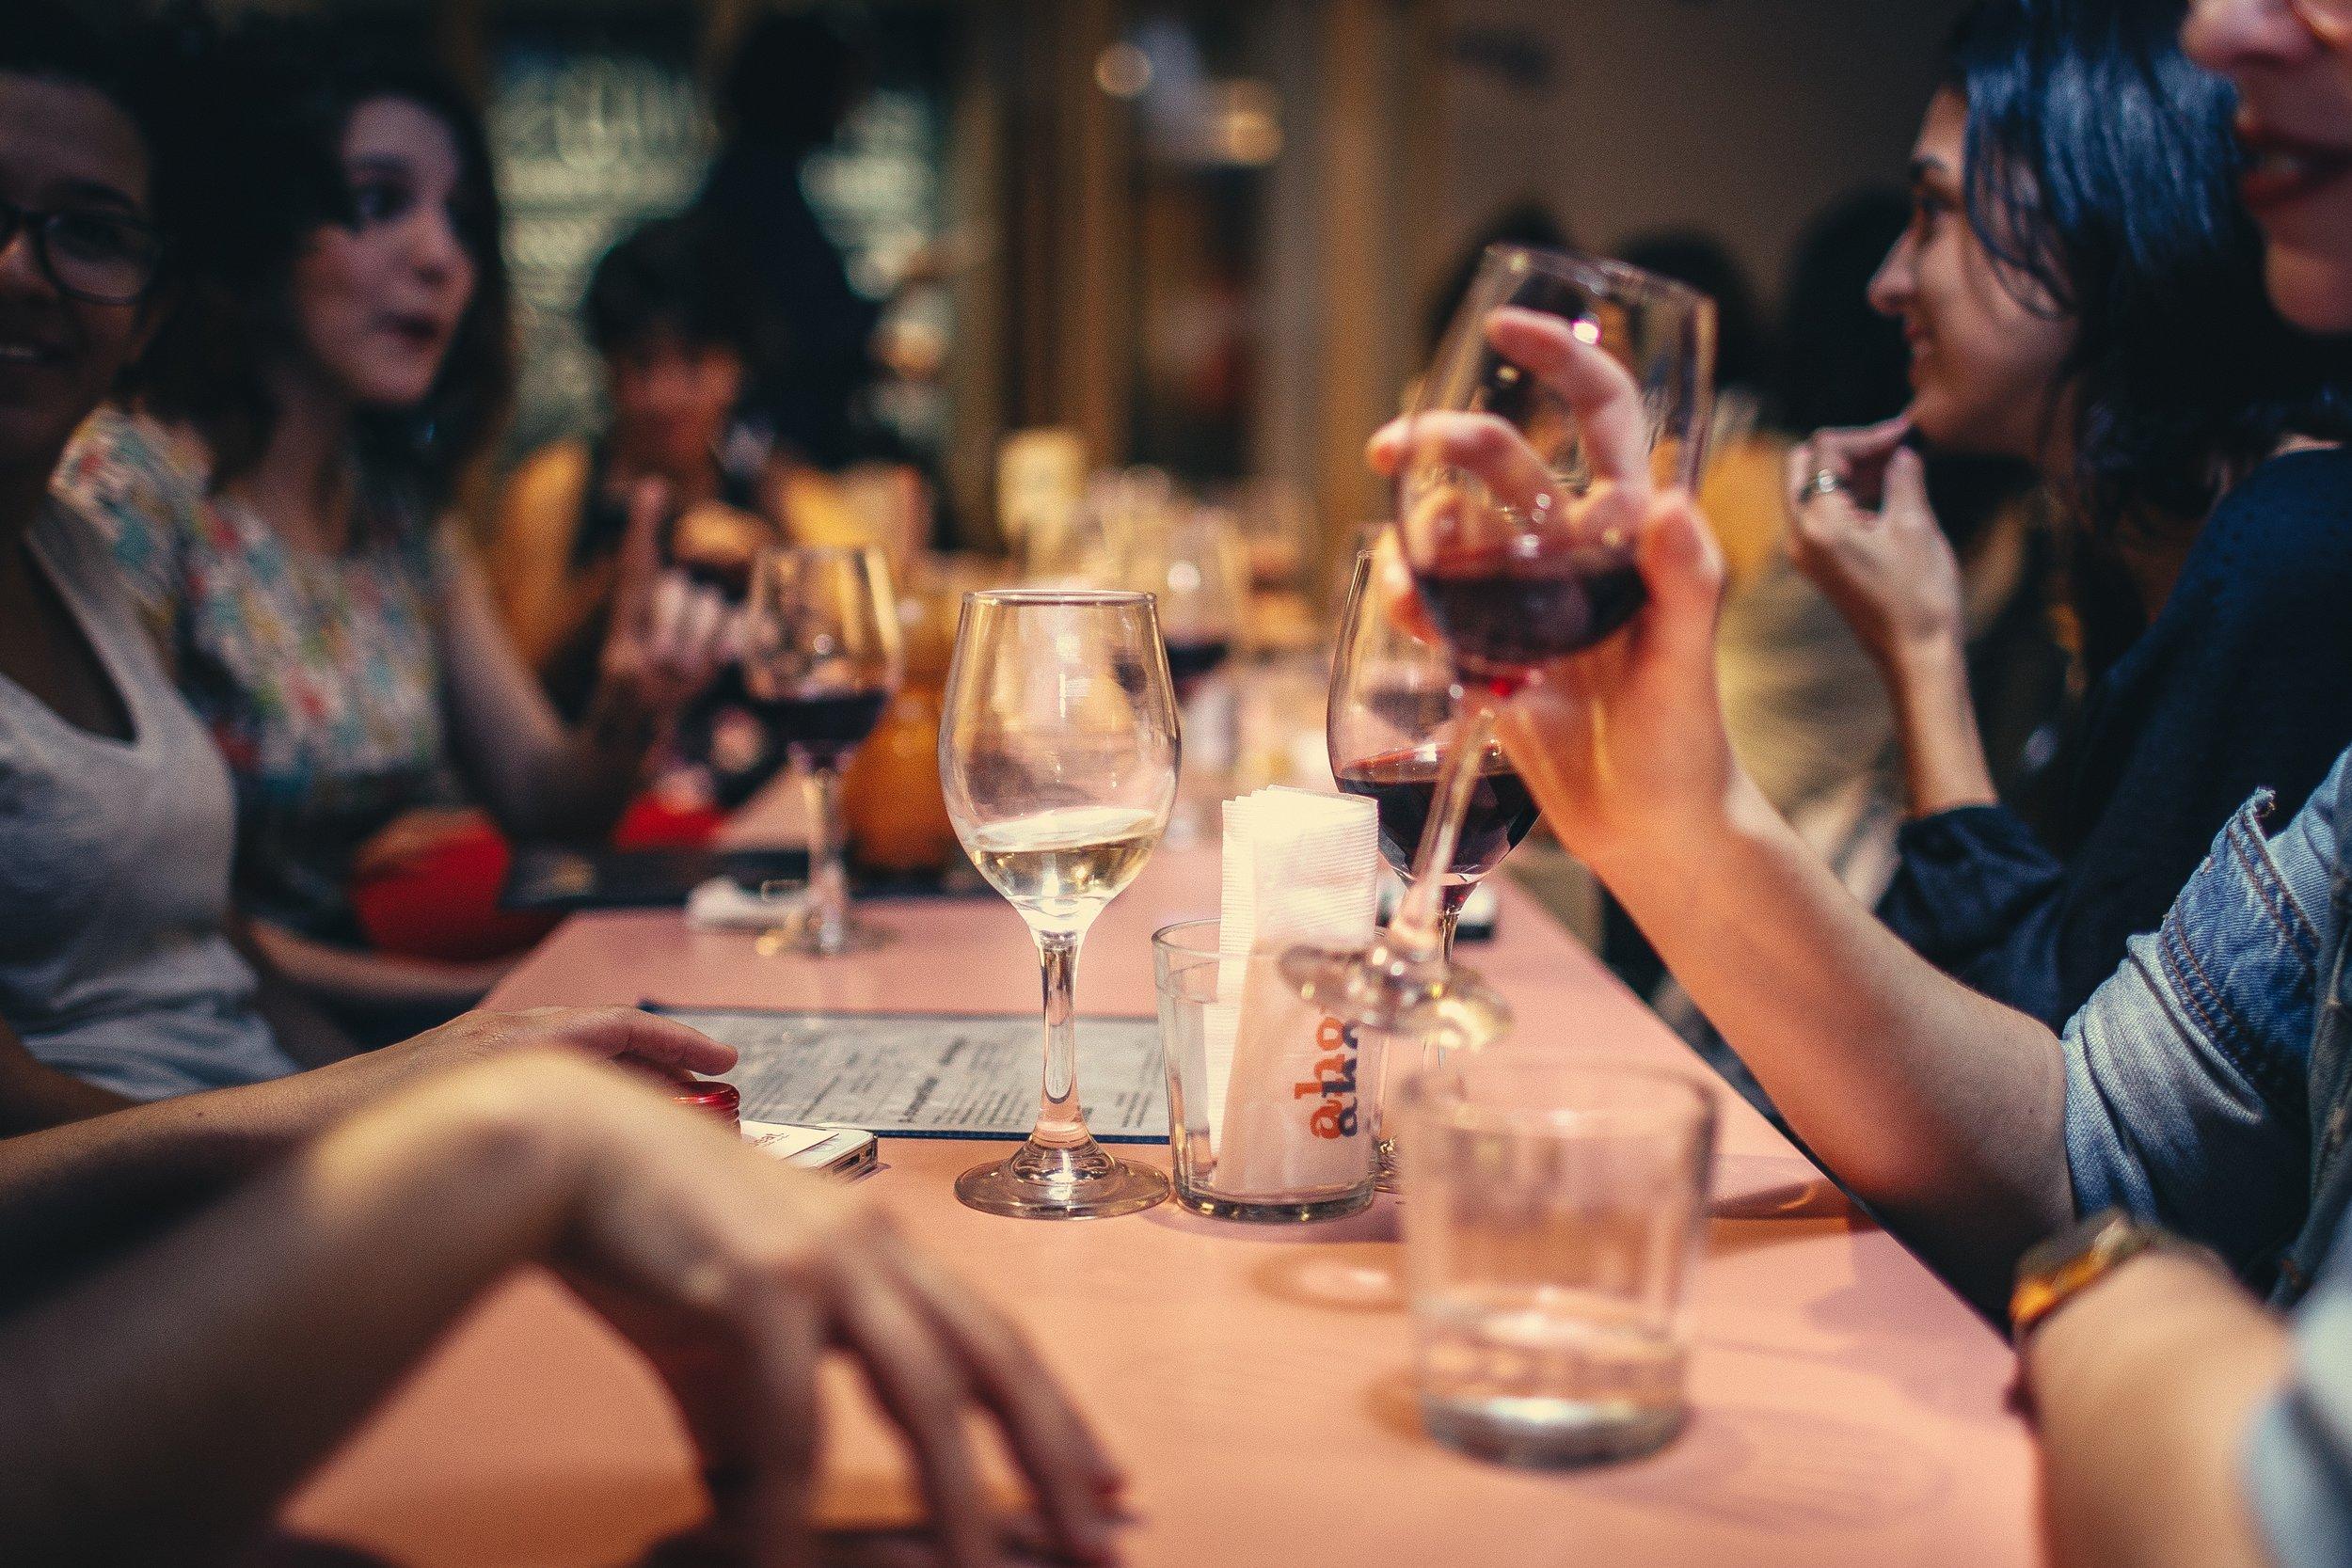 Women bonding over a shared meal